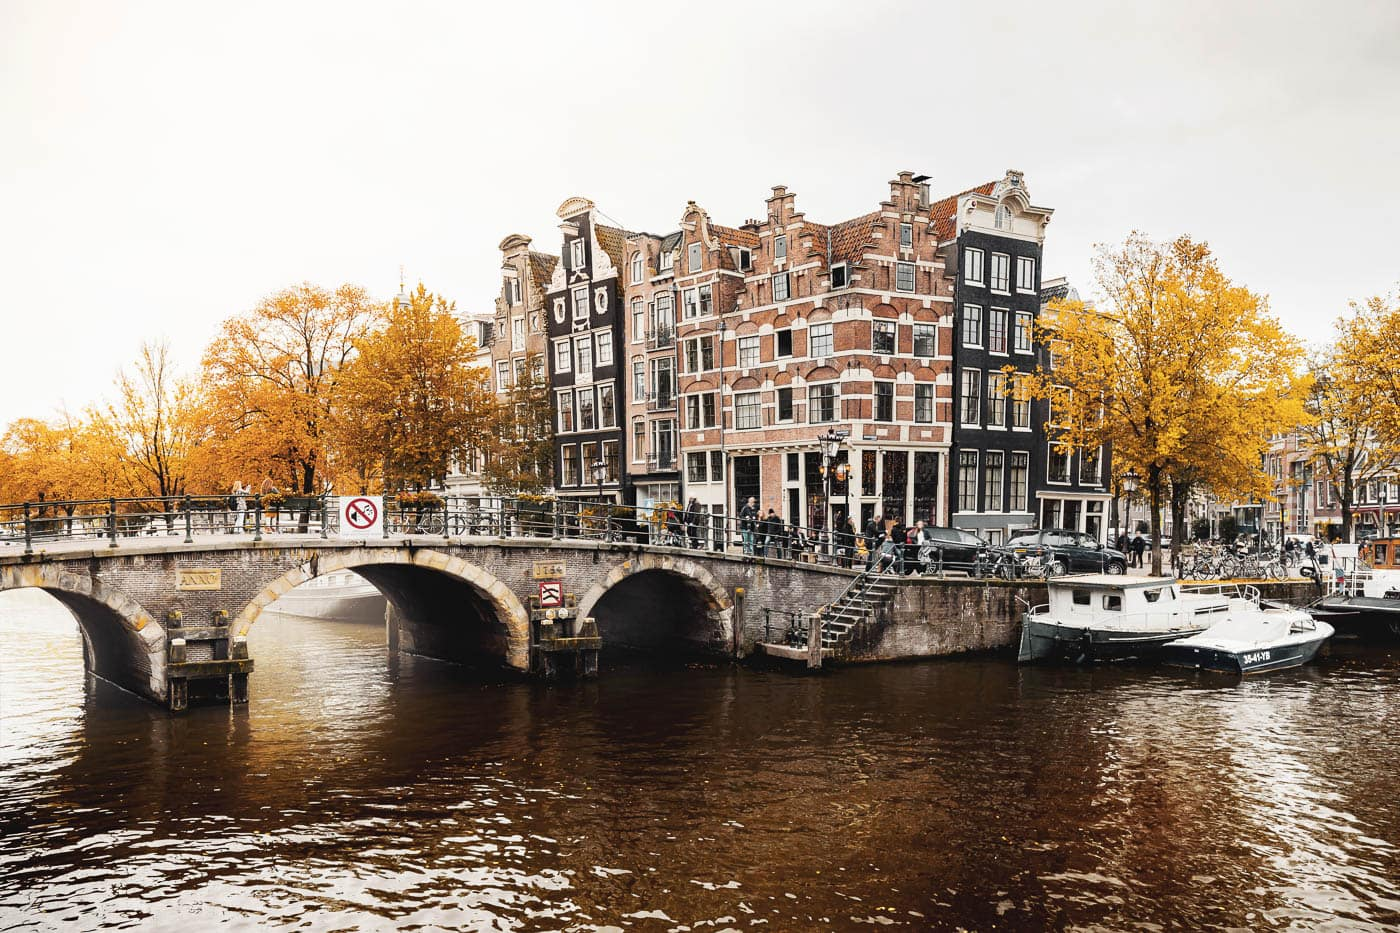 Herbst im Amsterdamer Stadtteil Jordaan